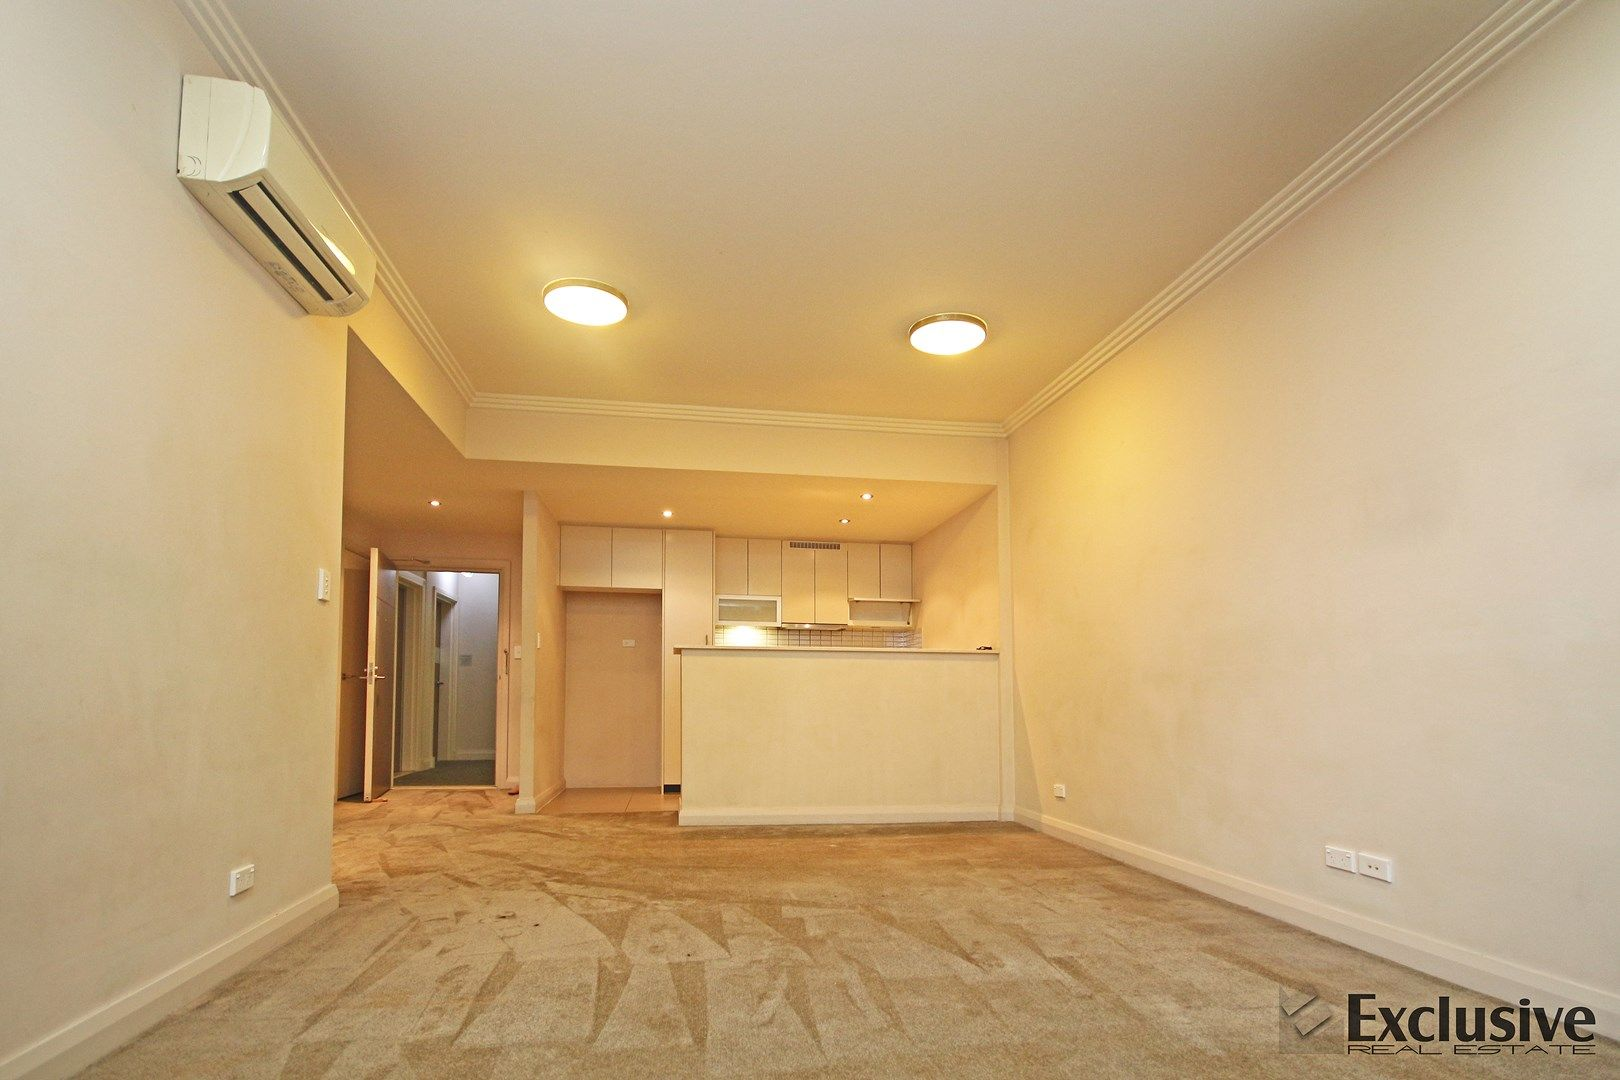 14/2 Underdale Lane, Meadowbank NSW 2114, Image 1